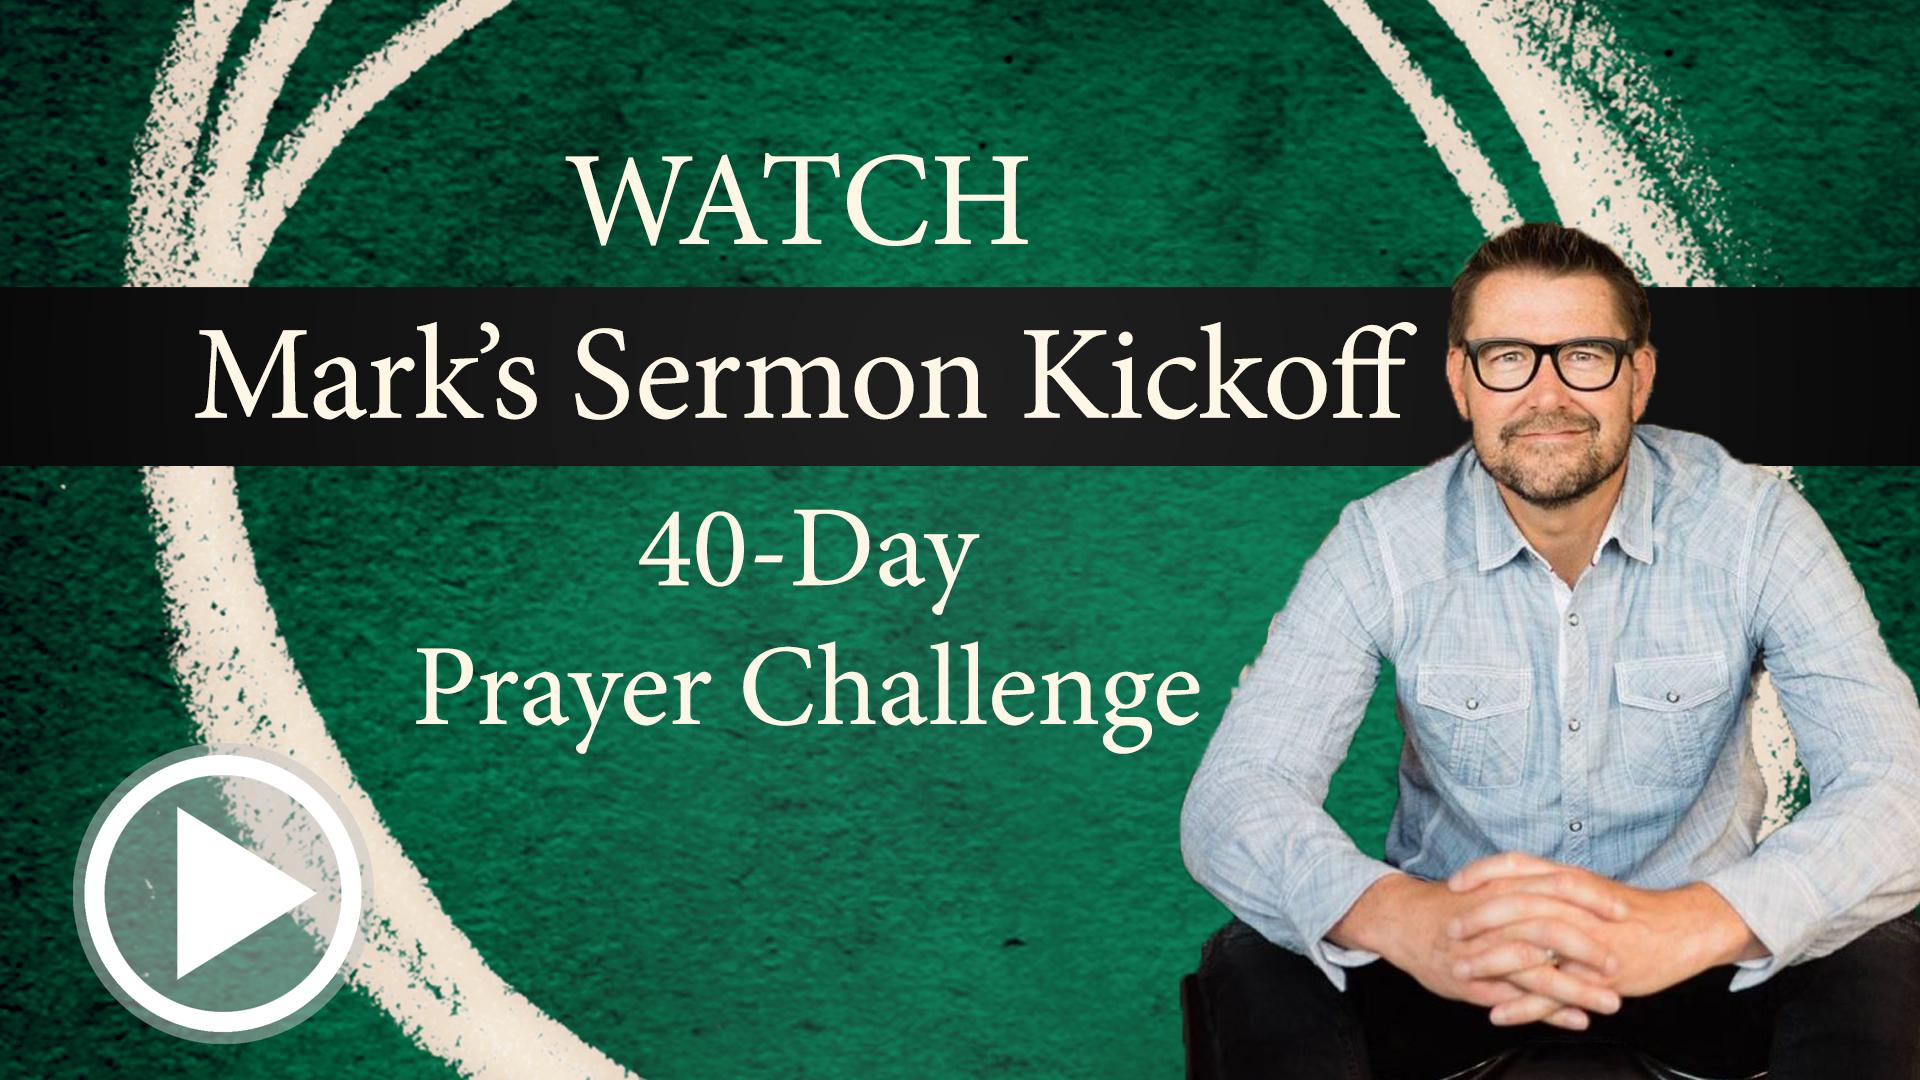 Mark's Sermon Kickoff